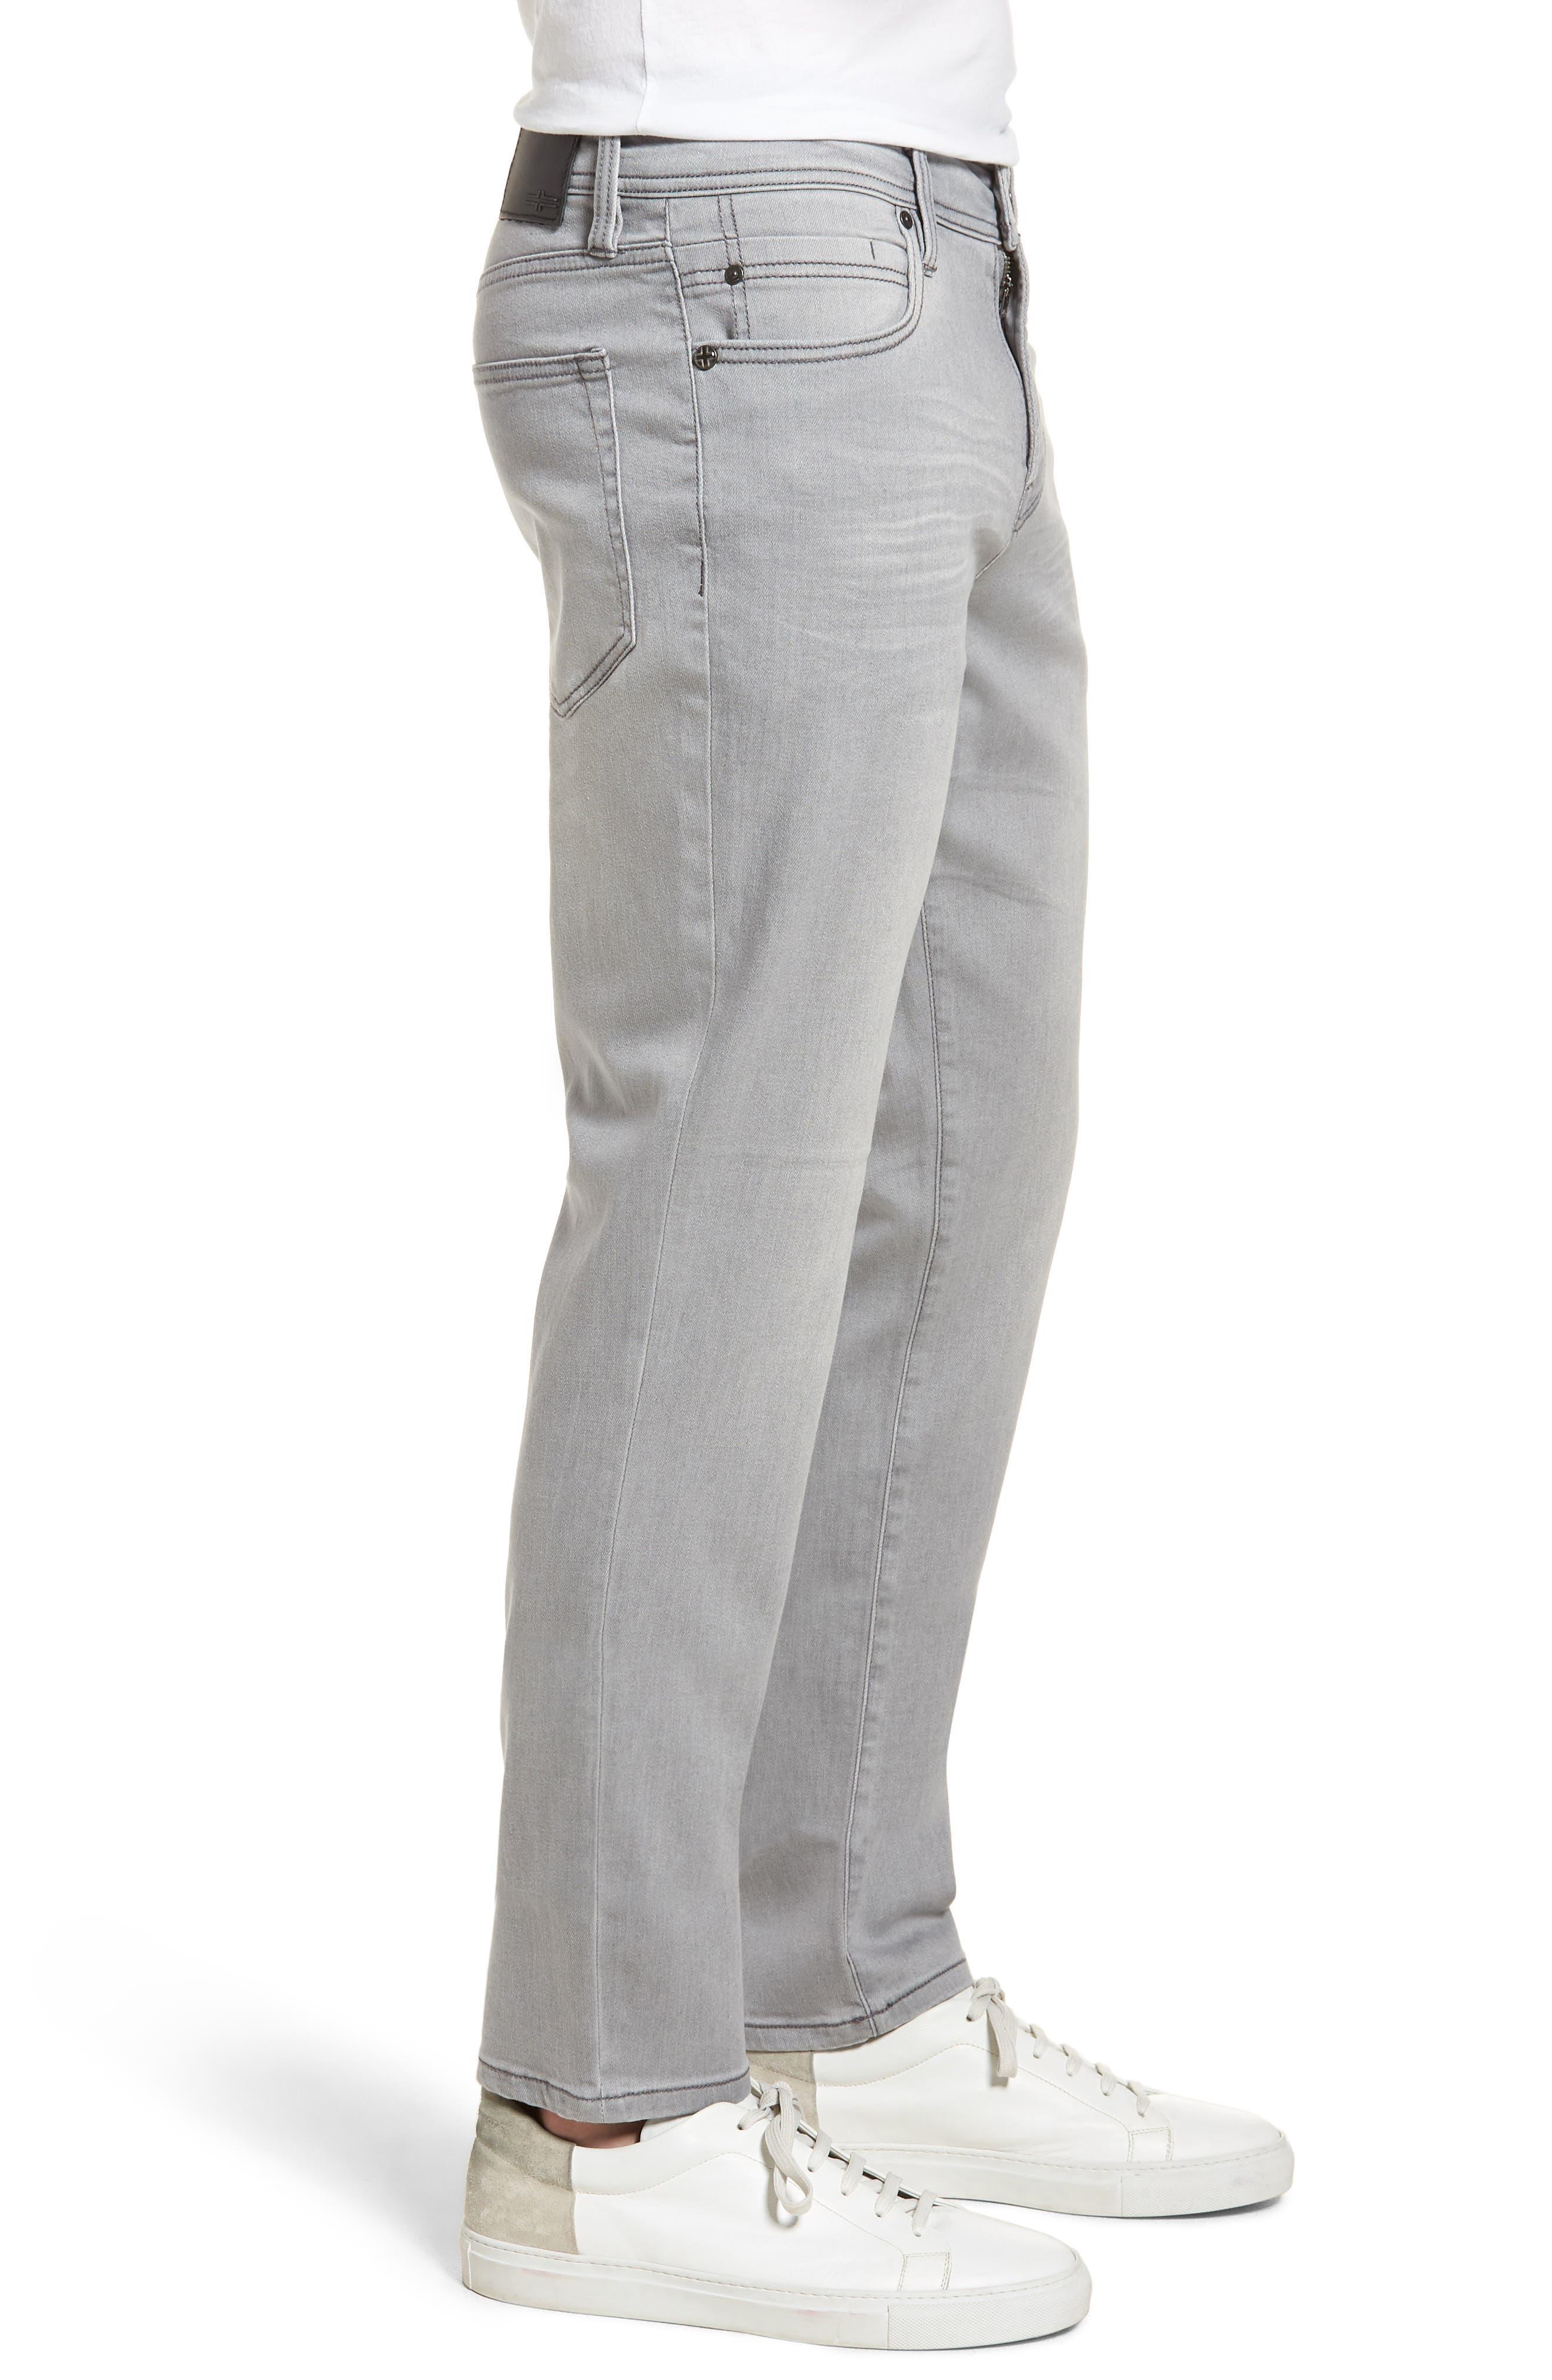 Jeans Co. Kingston Slim Straight Leg Jeans,                             Alternate thumbnail 3, color,                             Coal Mine Dark